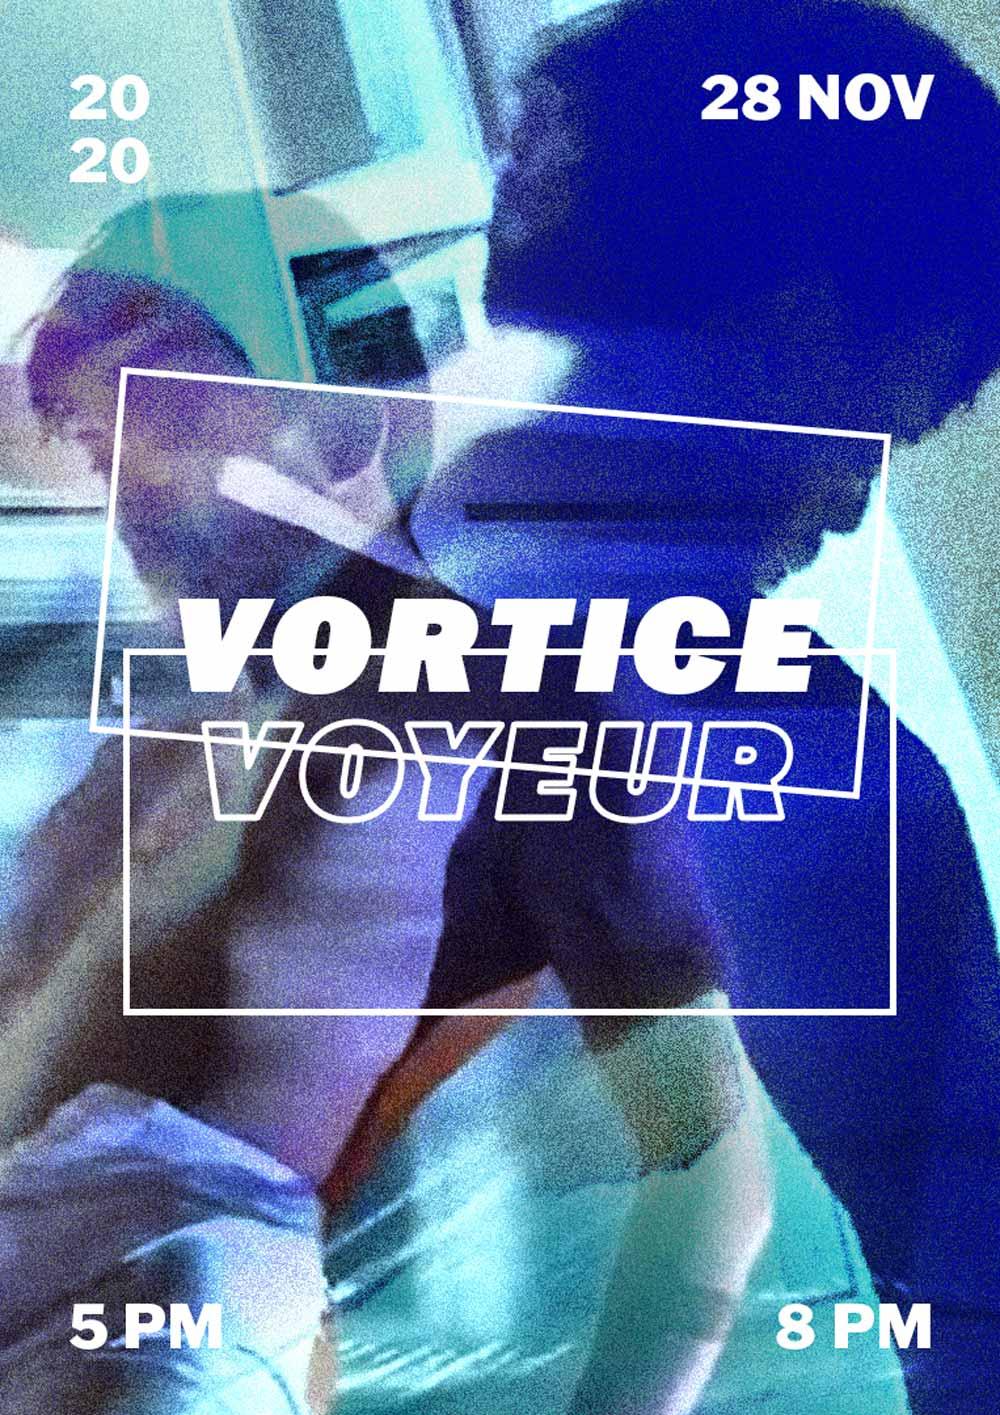 Vortice Voyeur: From Water Station, by Ota Shogo